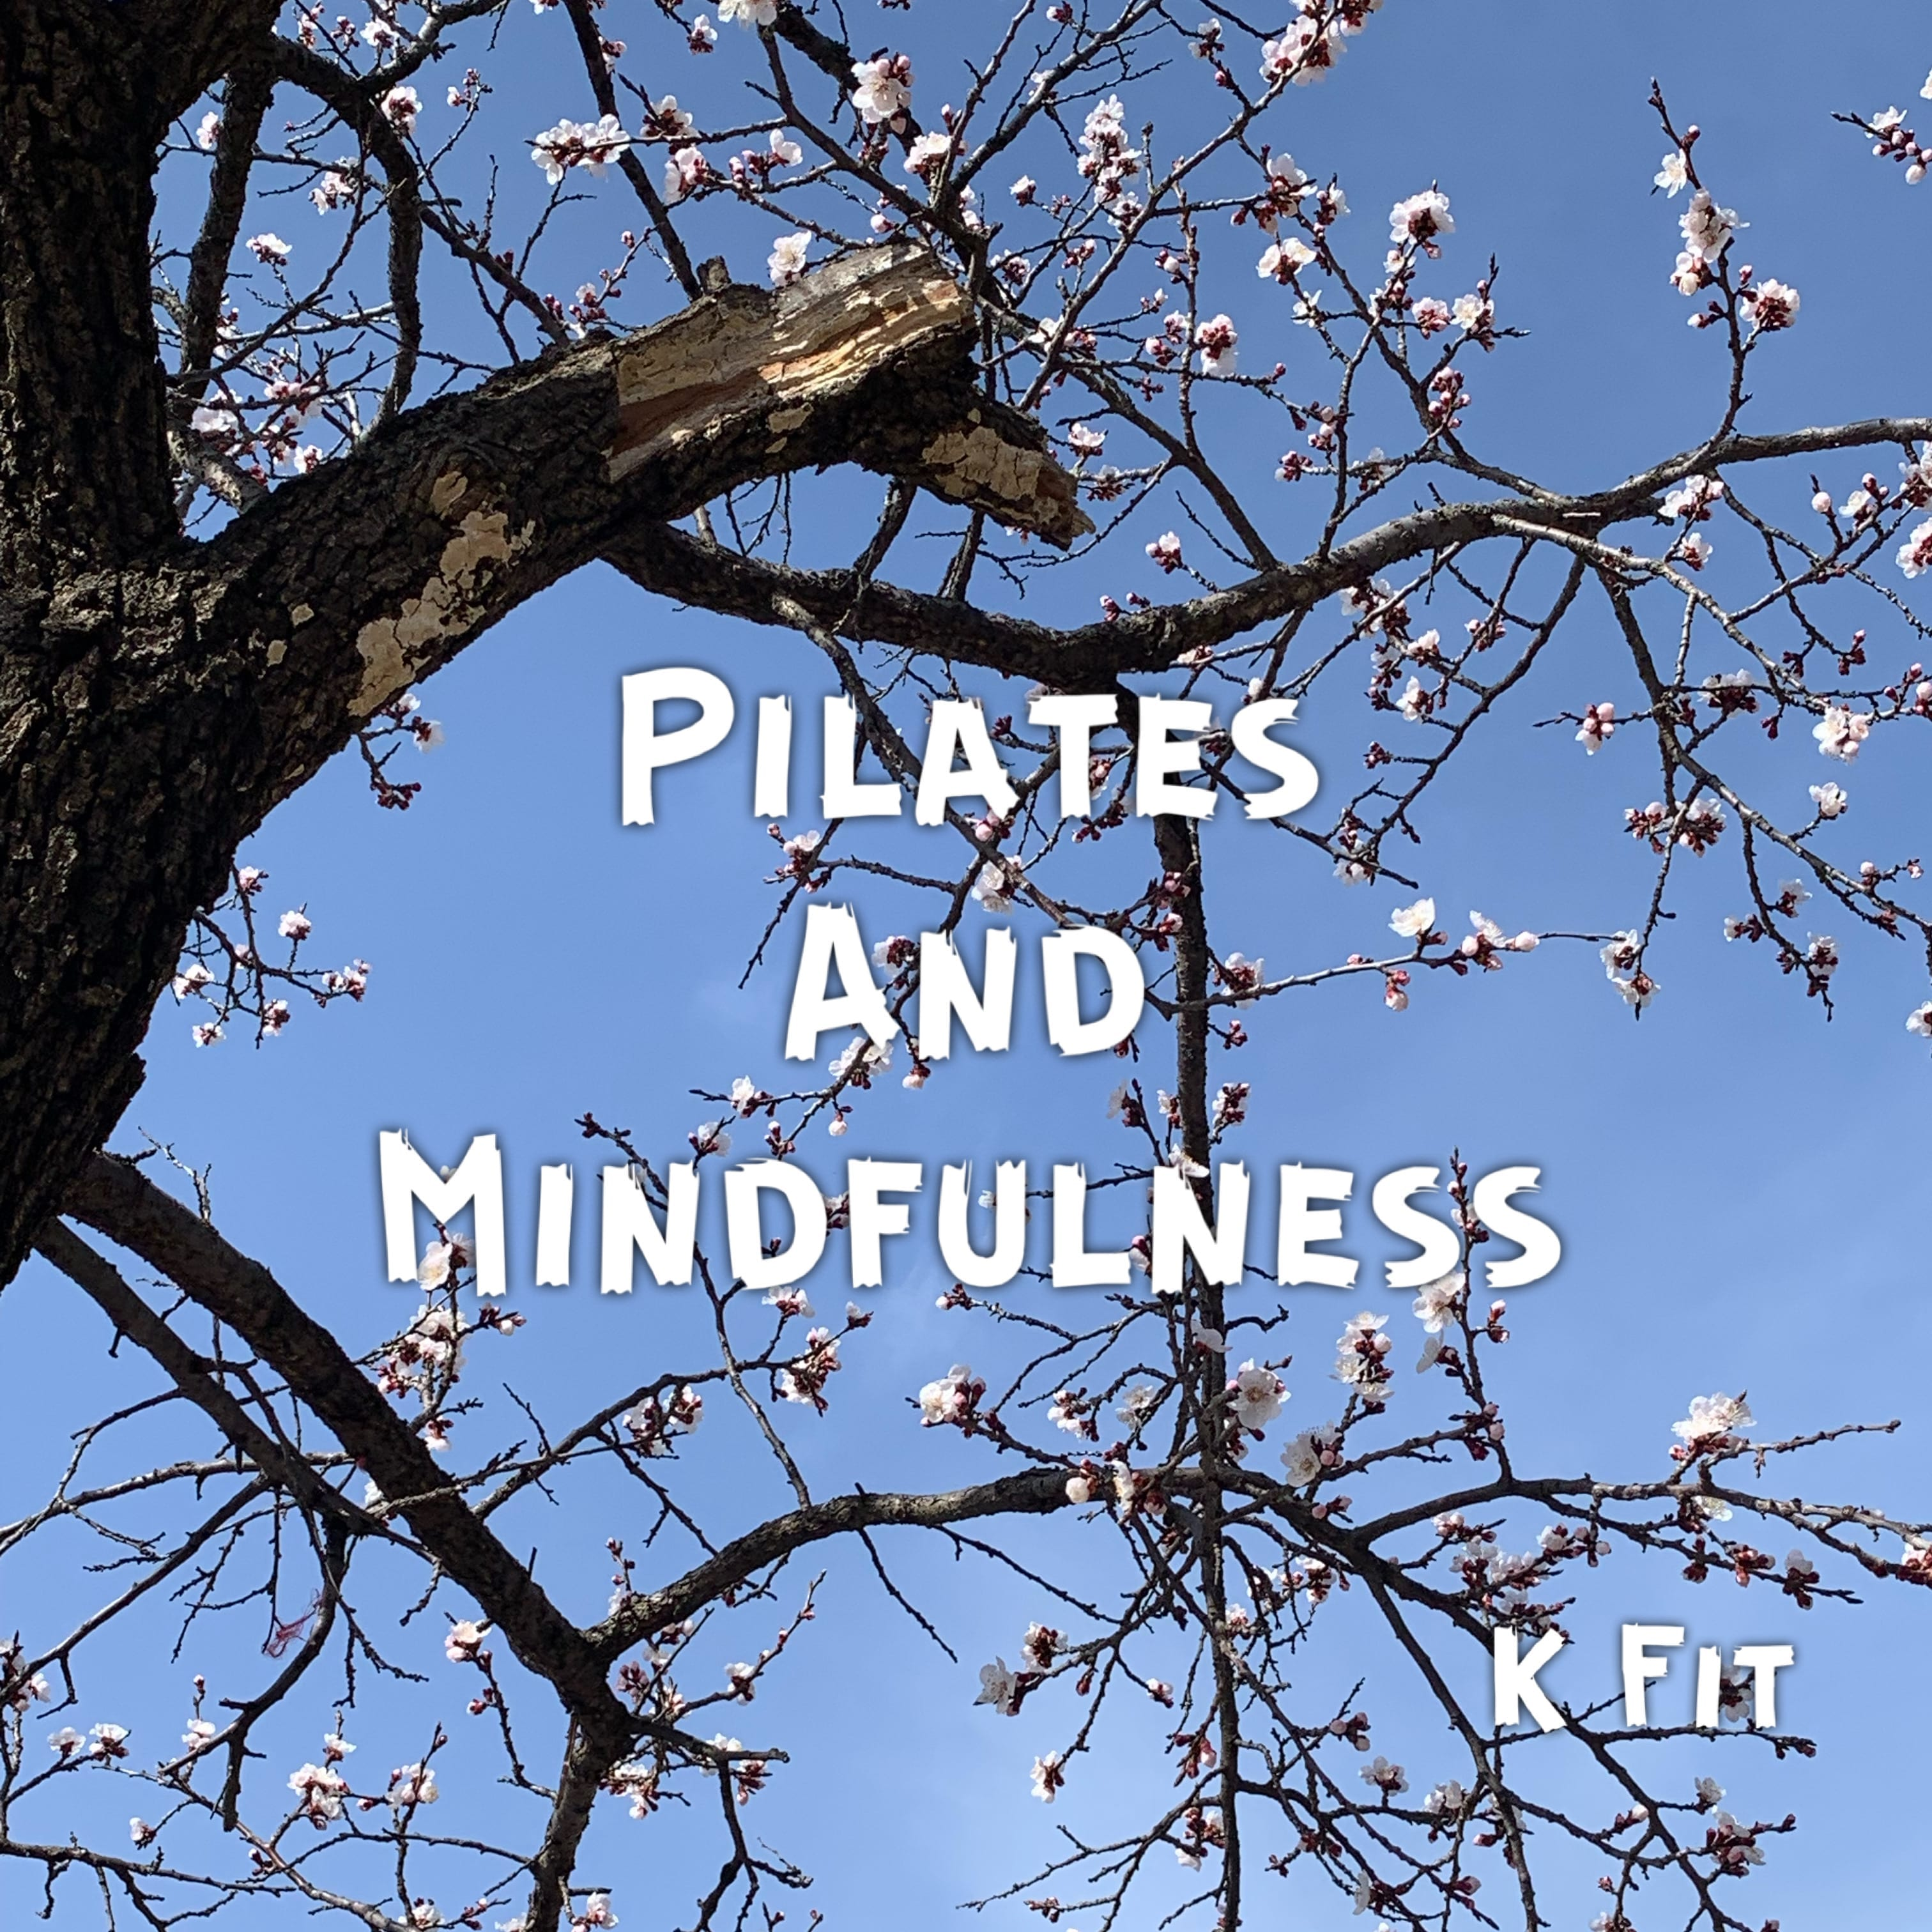 Pilates and Mindfulness